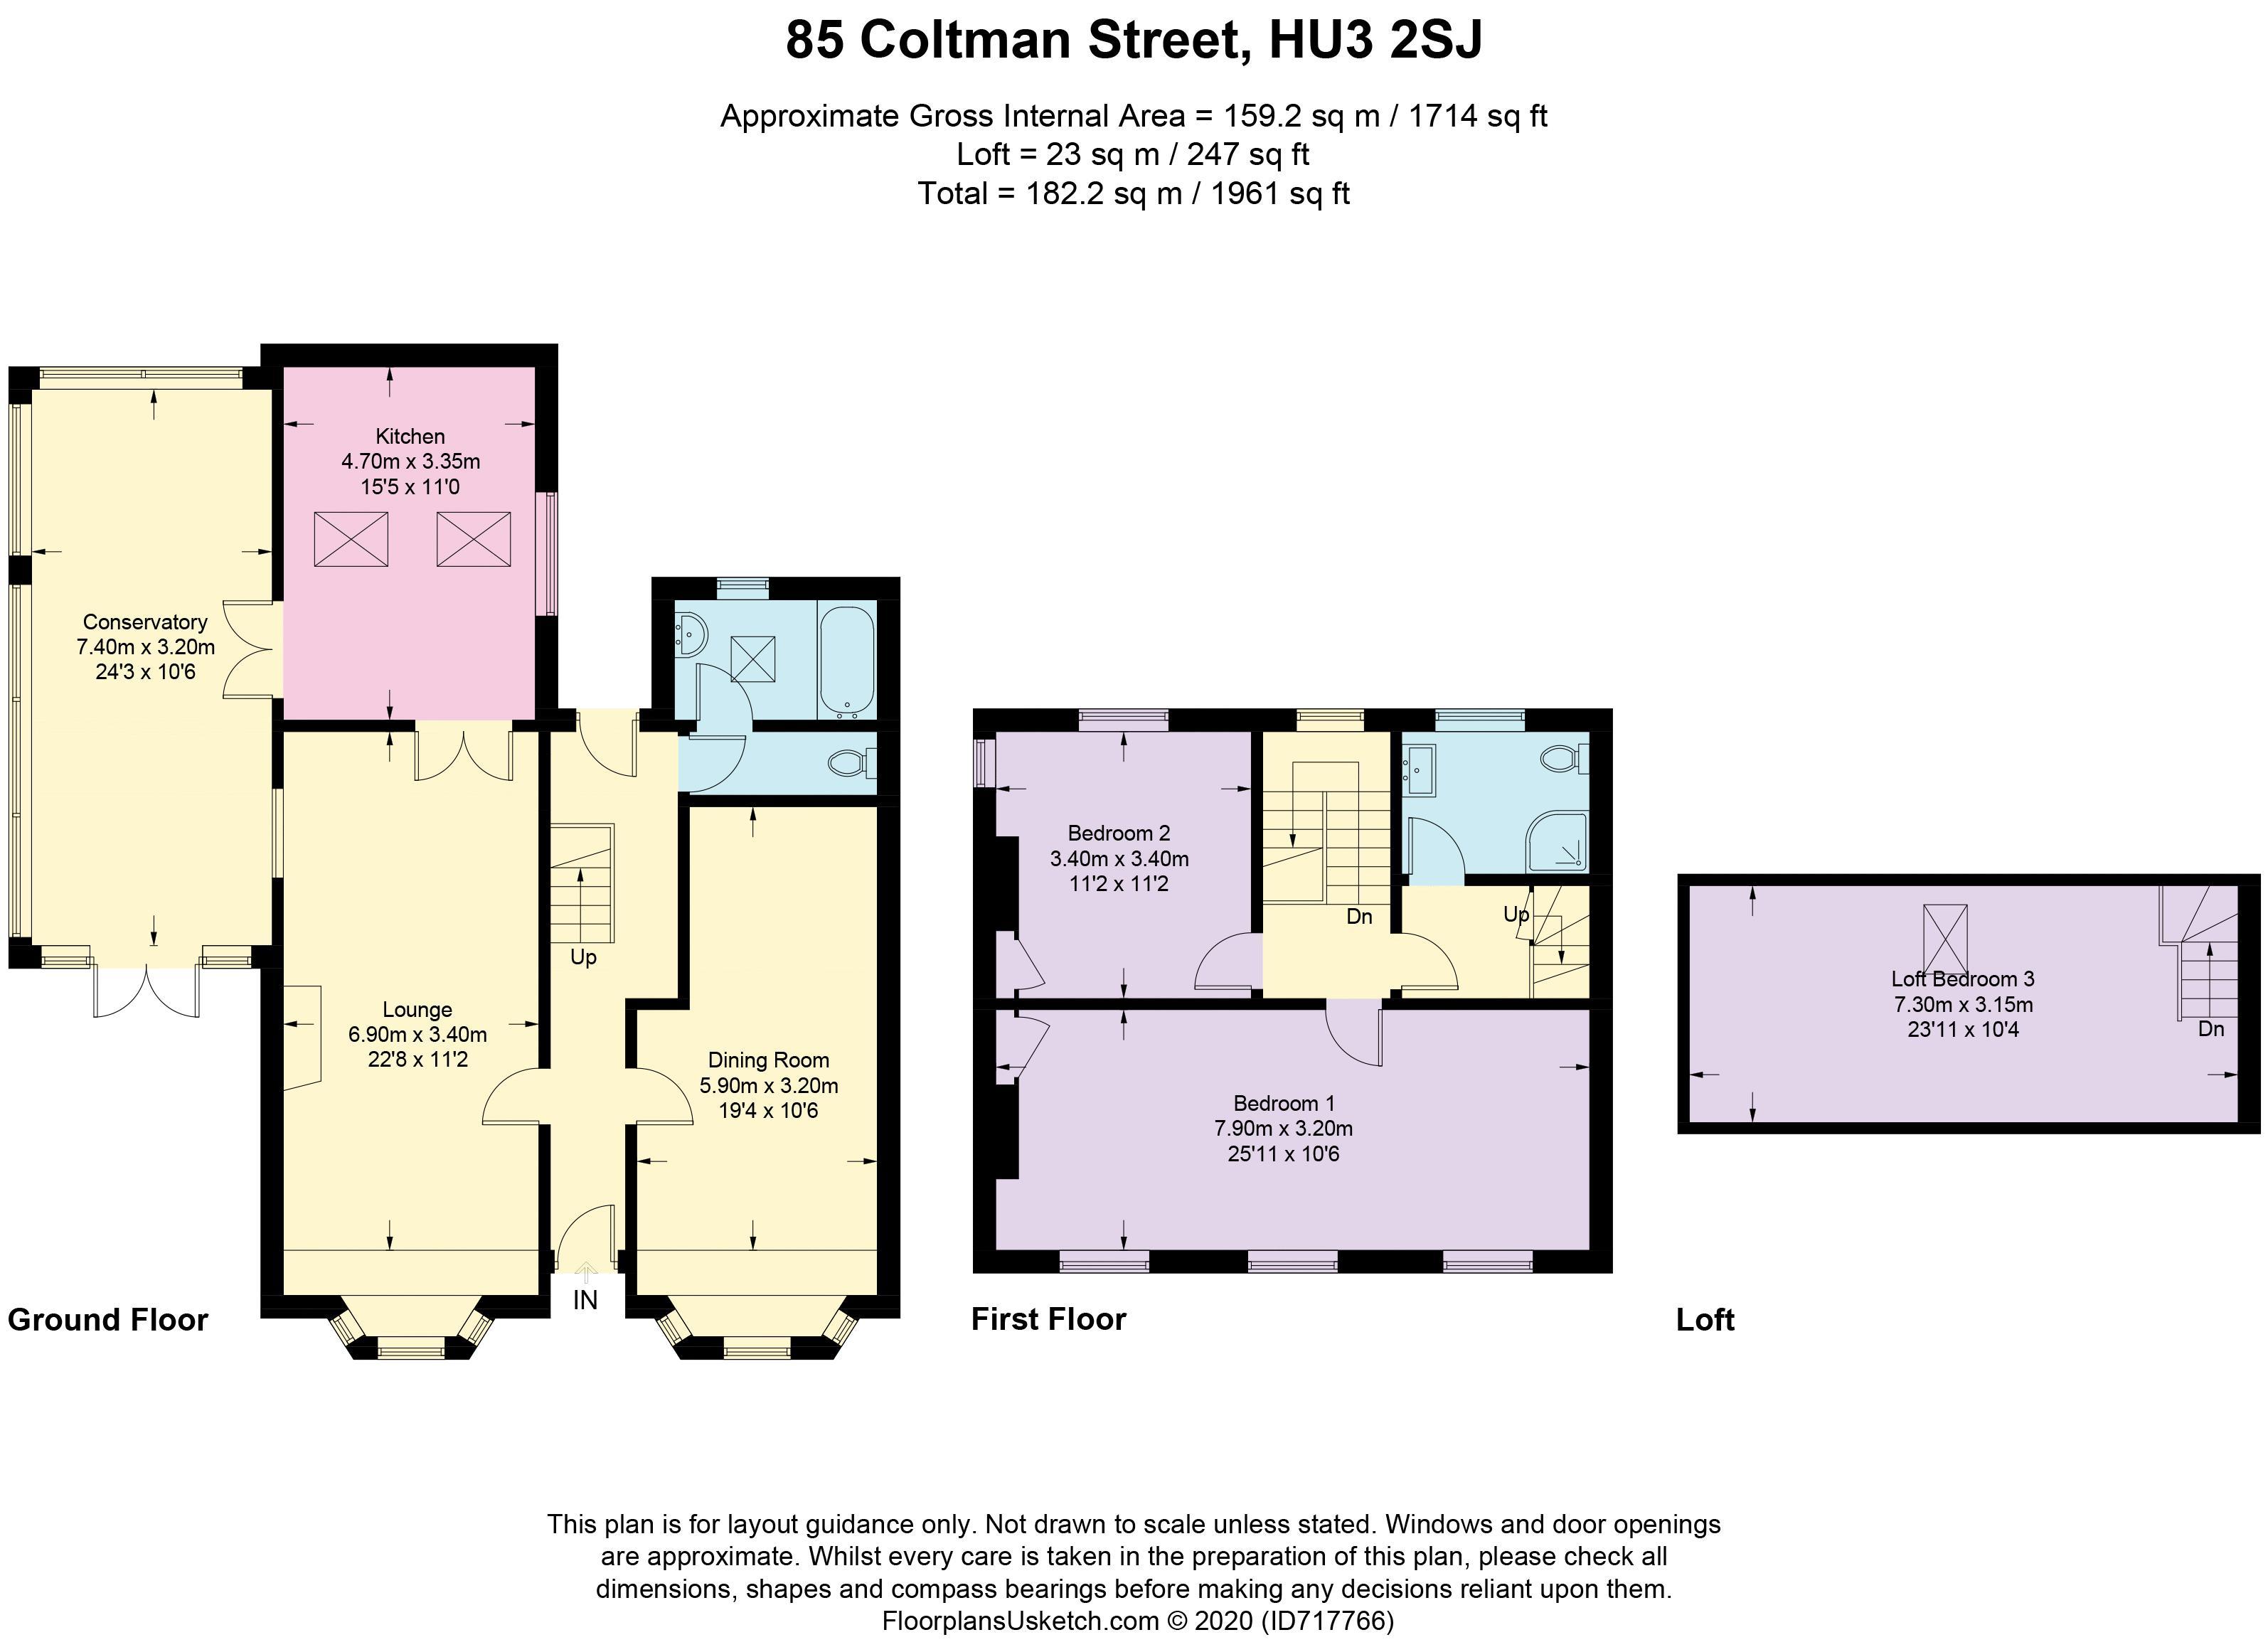 Coltman Street